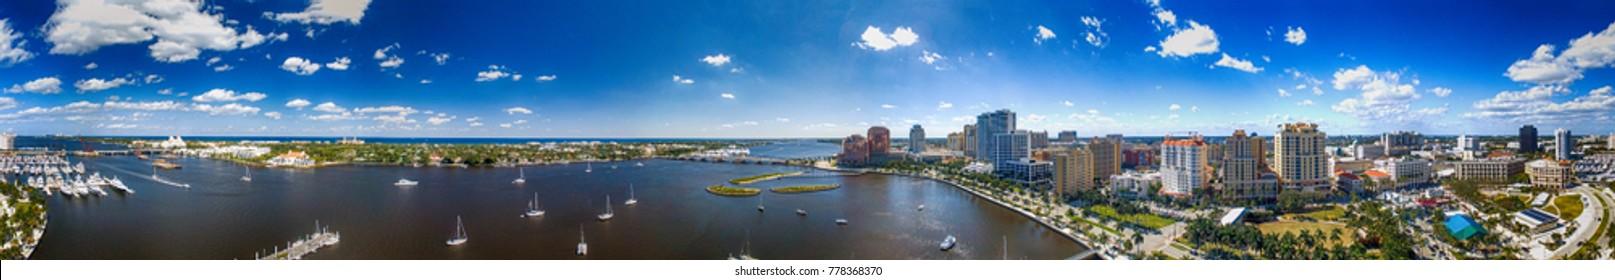 Palm Beach panoramic aerial view, Florida.